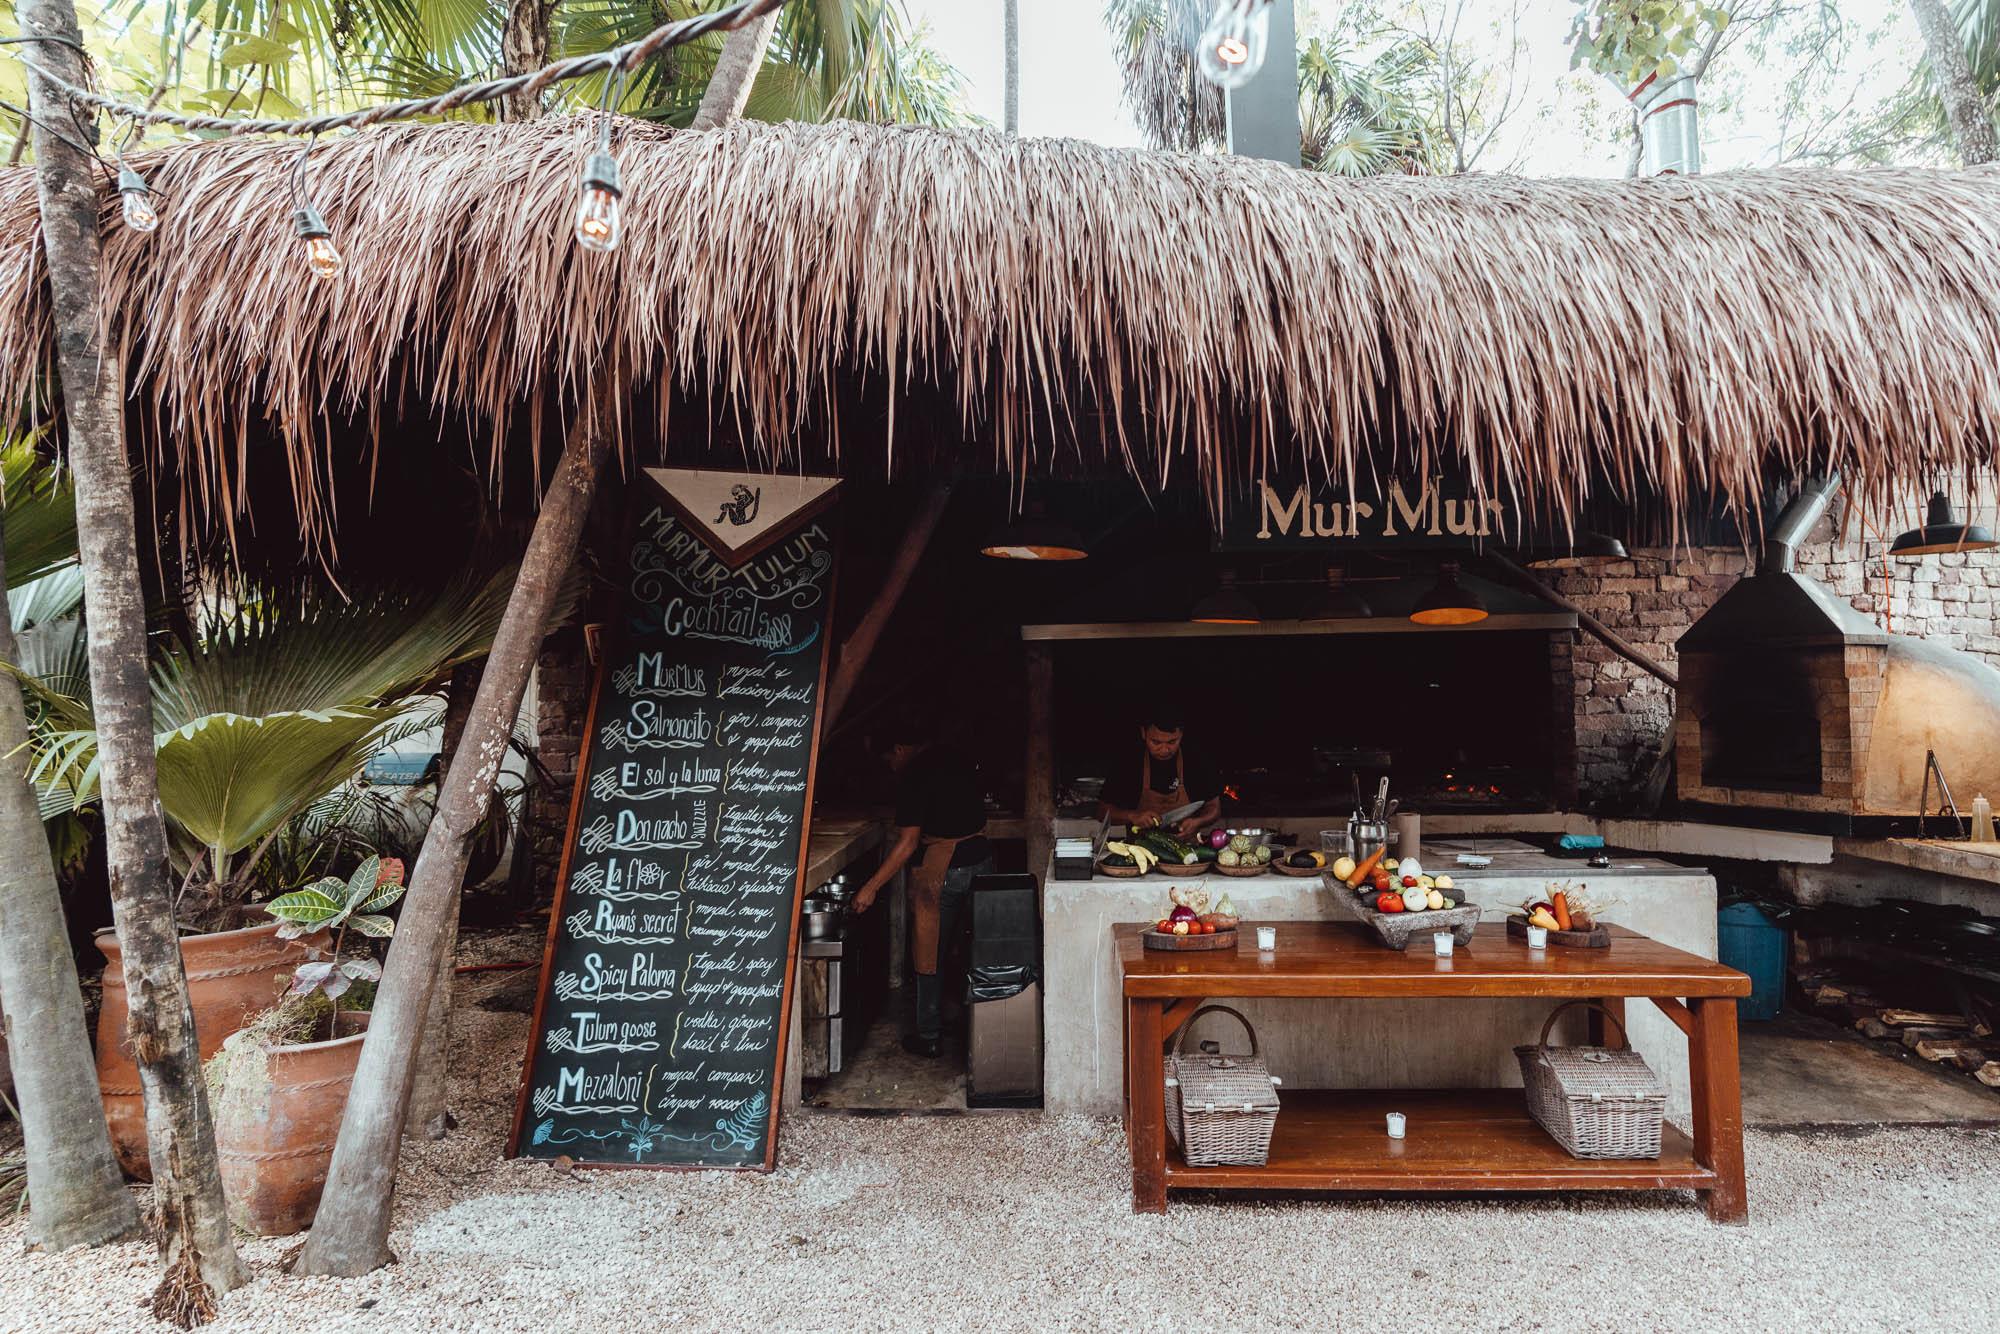 Mur Mur restaurant Tulum Quintana Roo Mexico via Find Us Lost